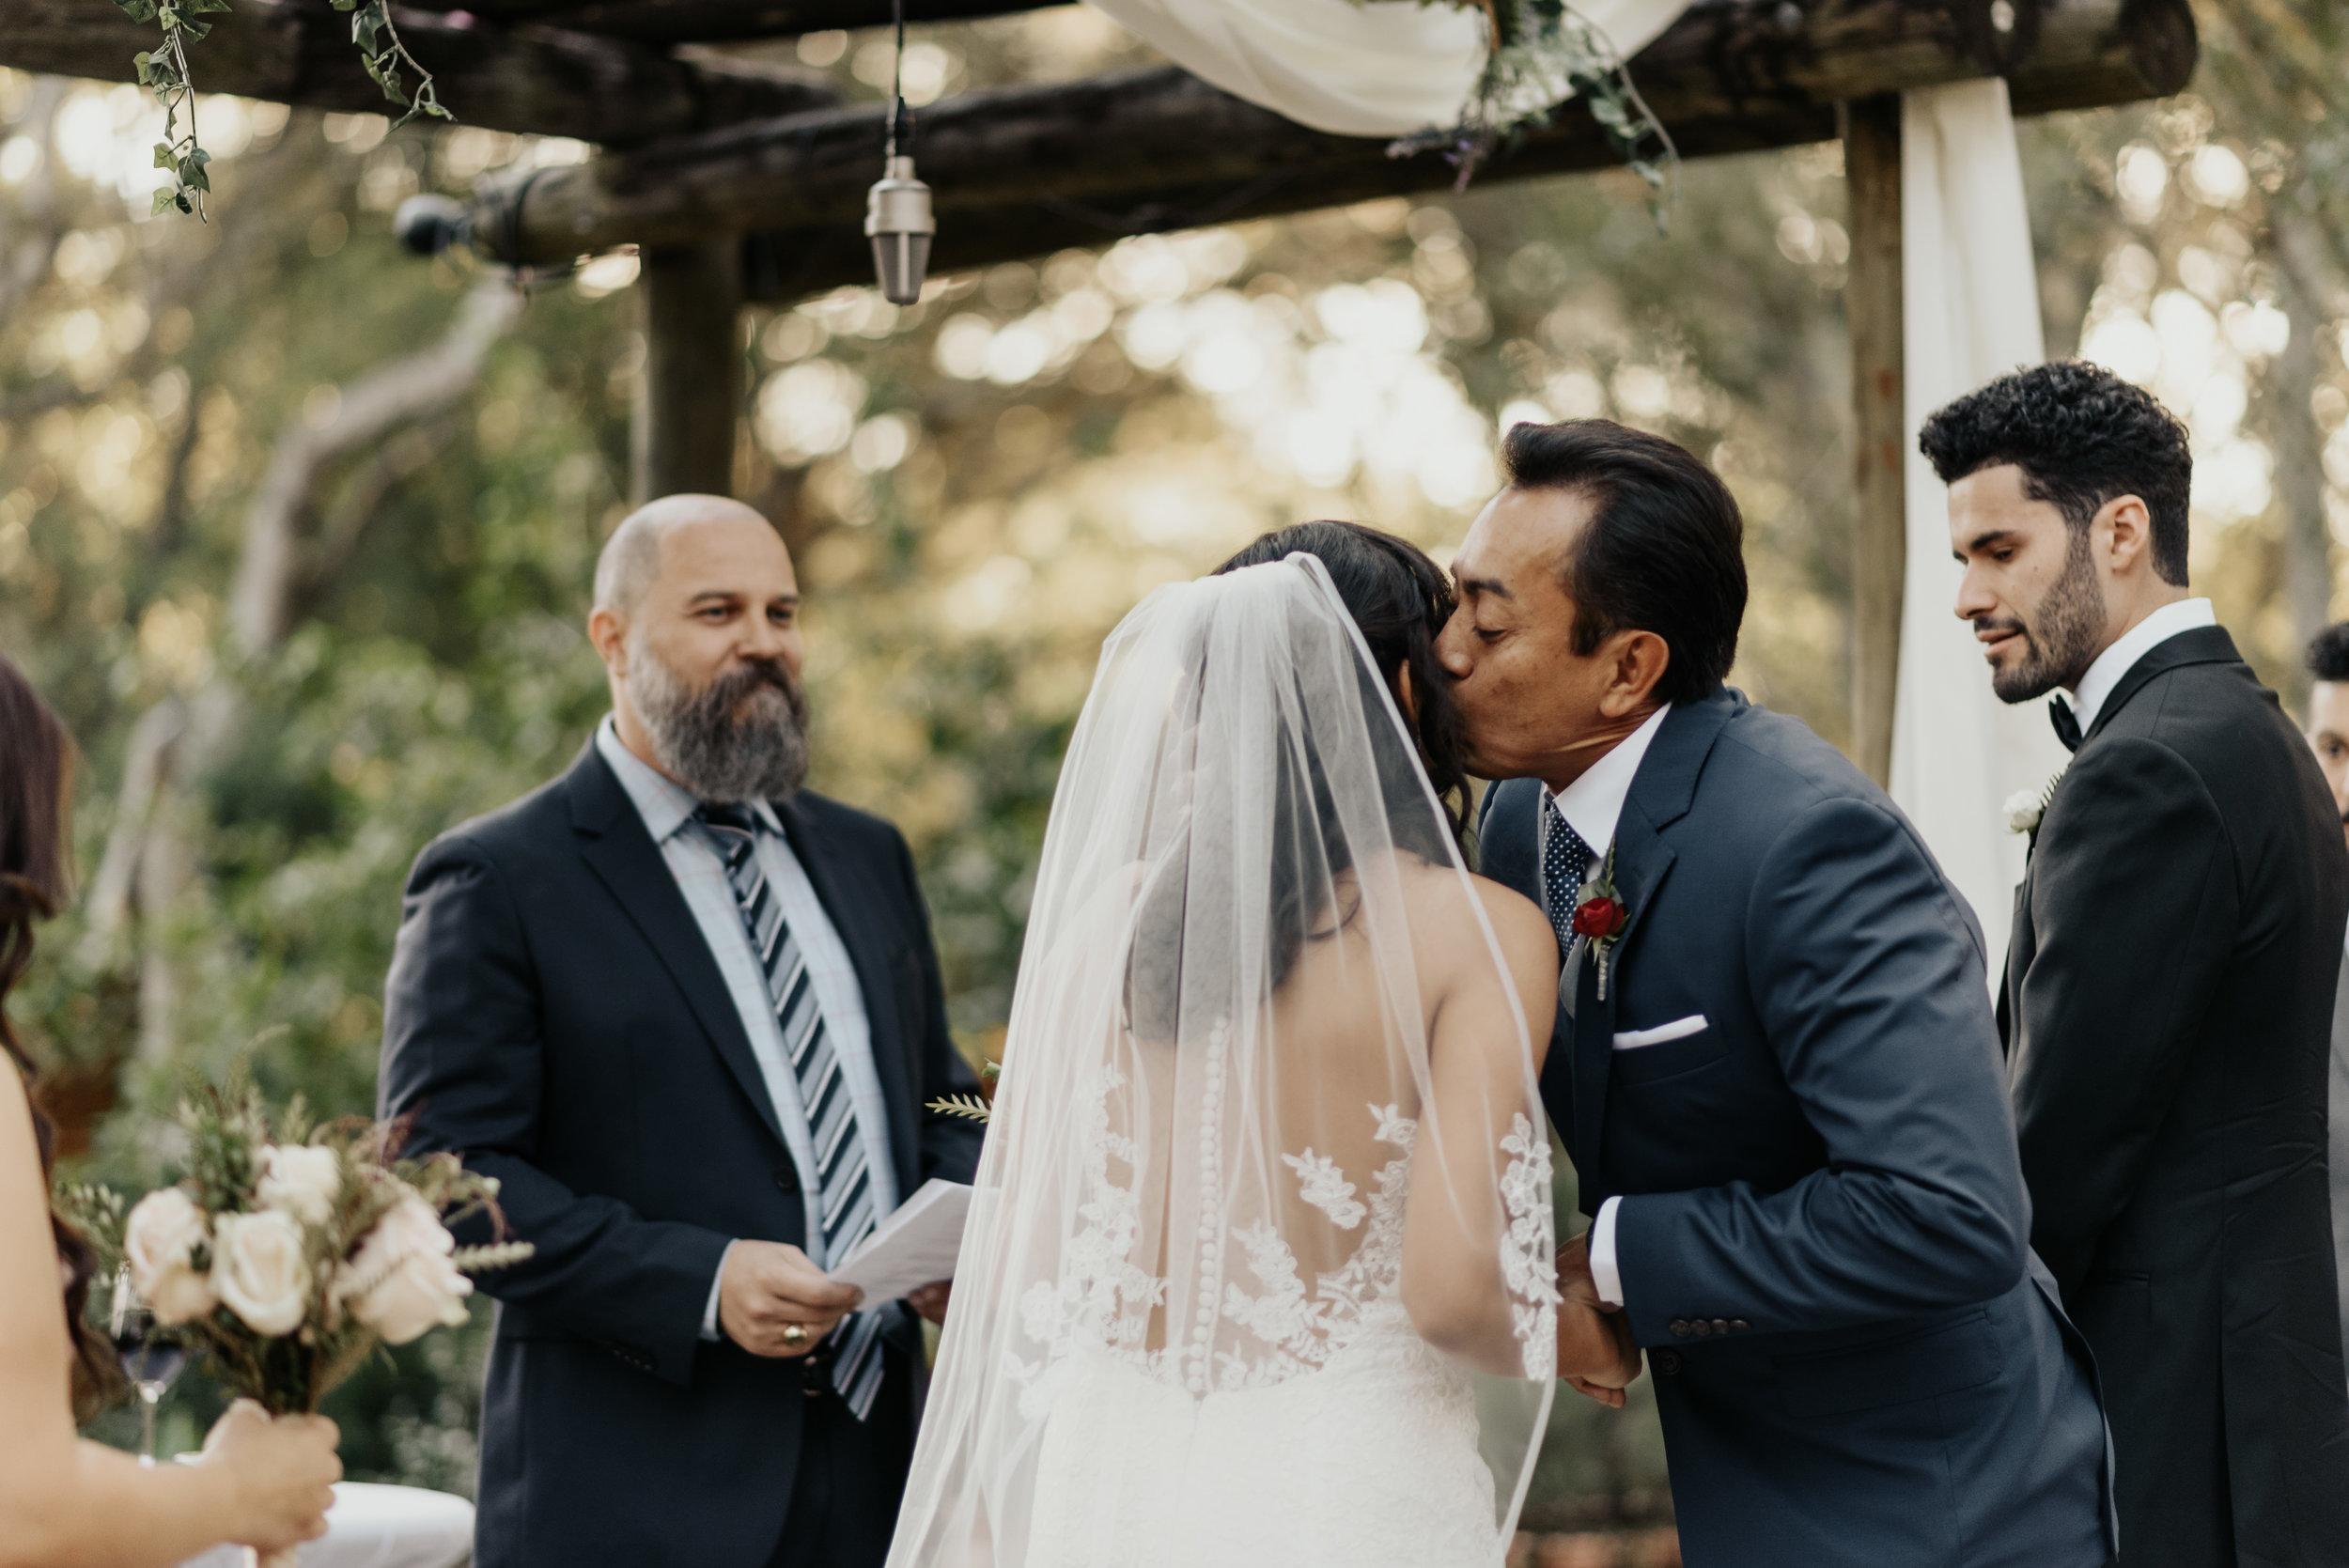 Kirstie-AJ-Wedding-9938.jpg